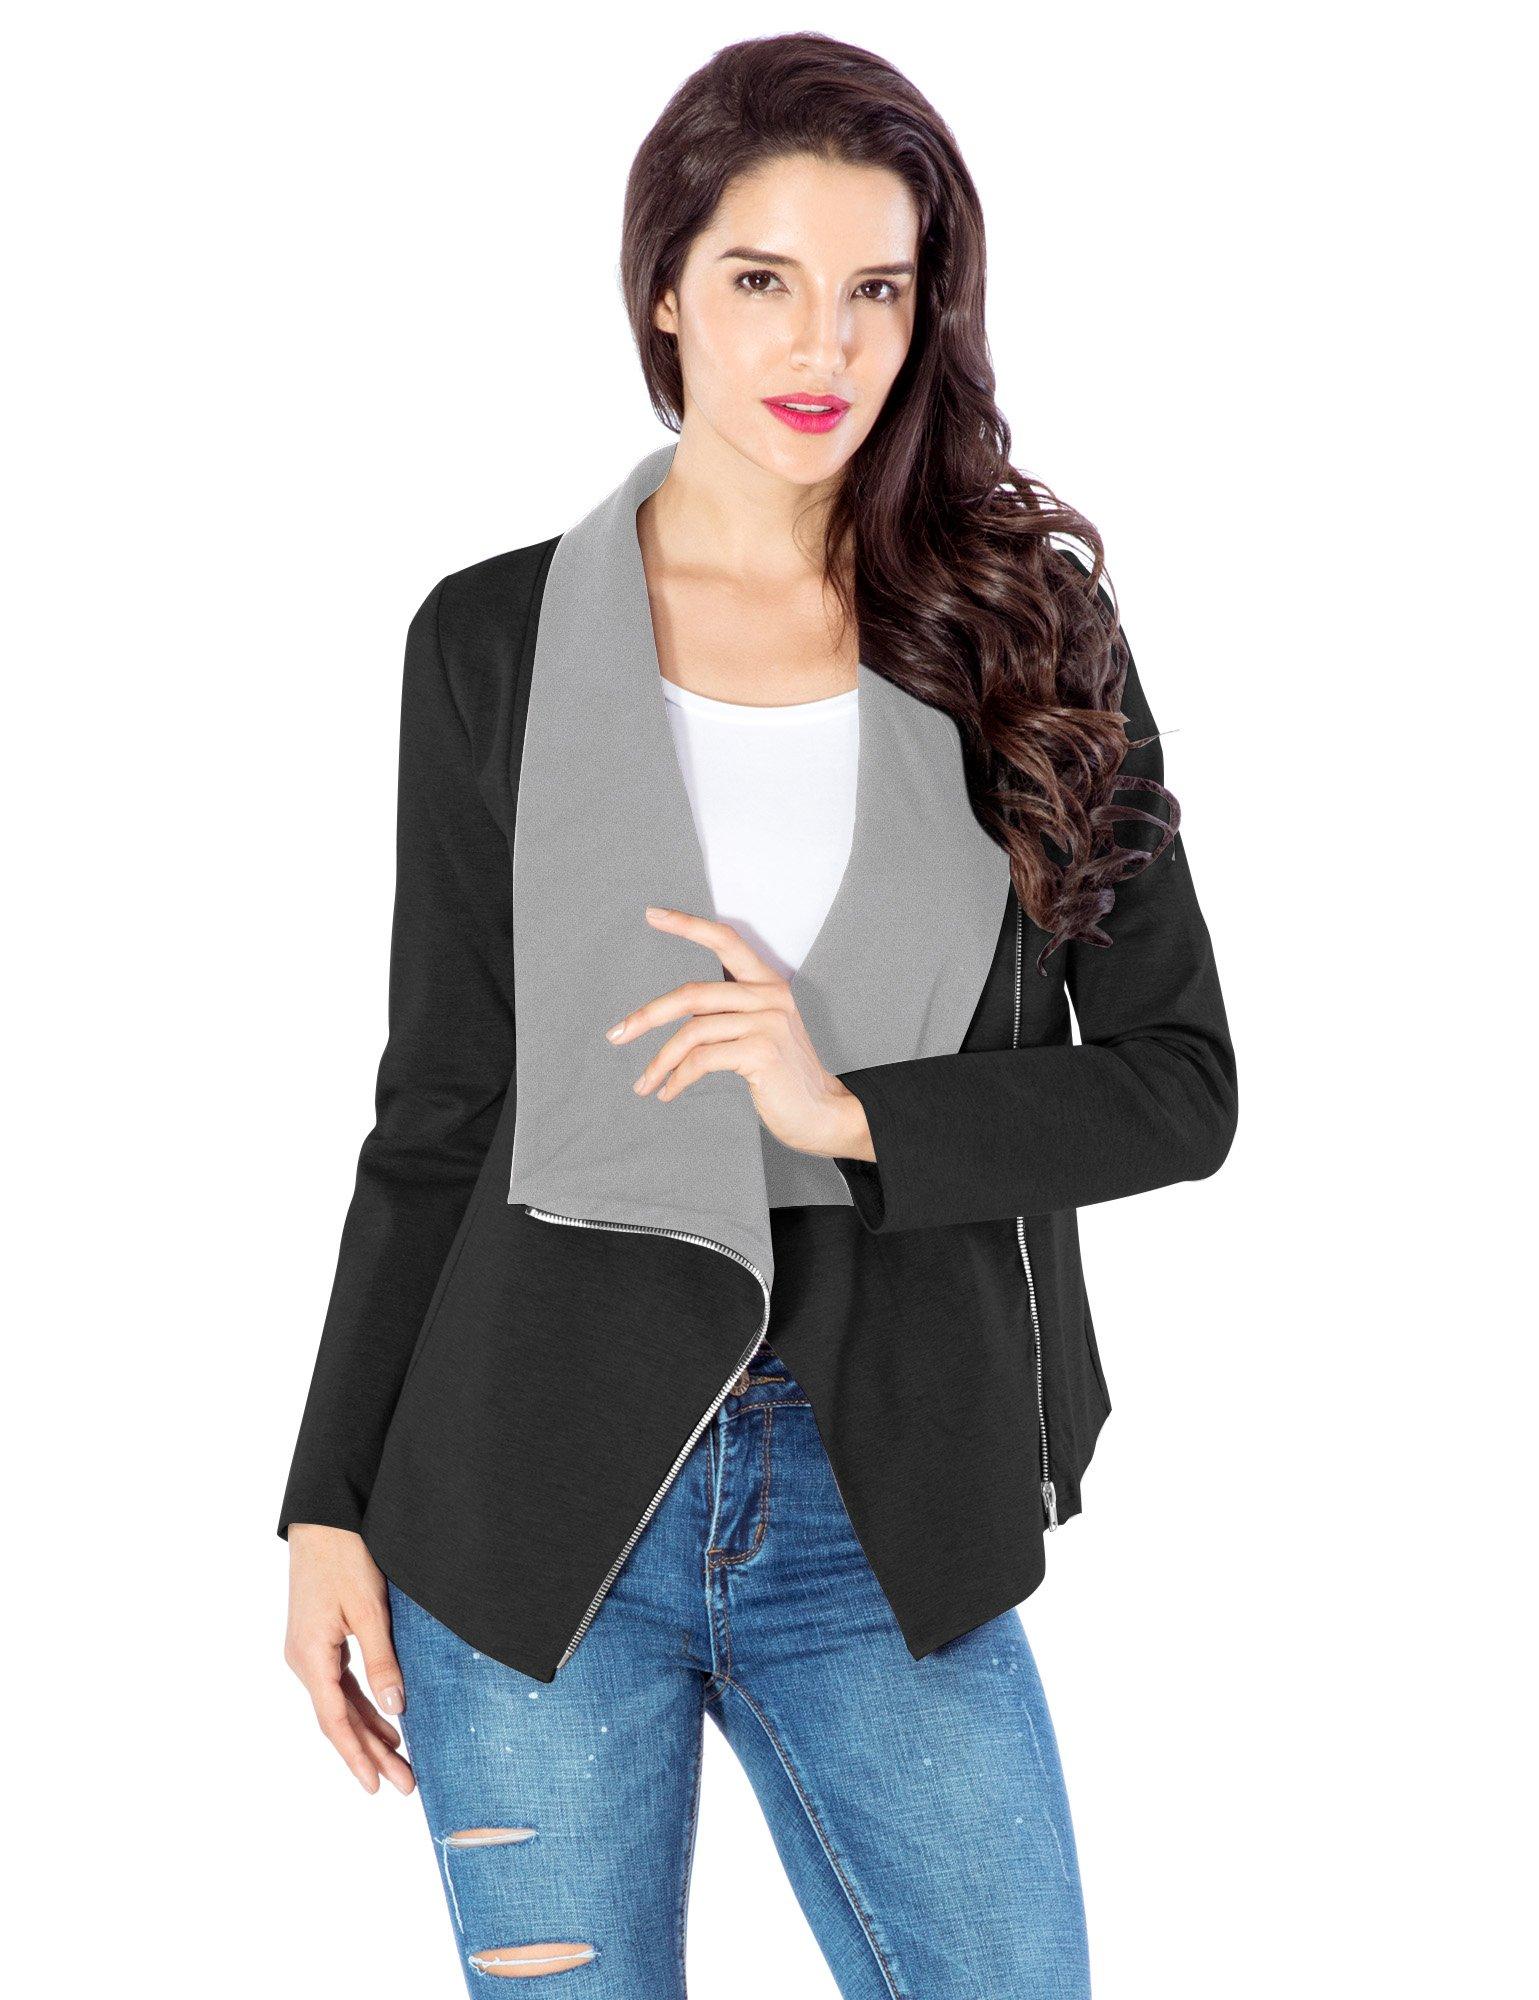 Lookbook Store Women's Casual Black Contrast Draped Asymmetric Blazer Jacket US 8